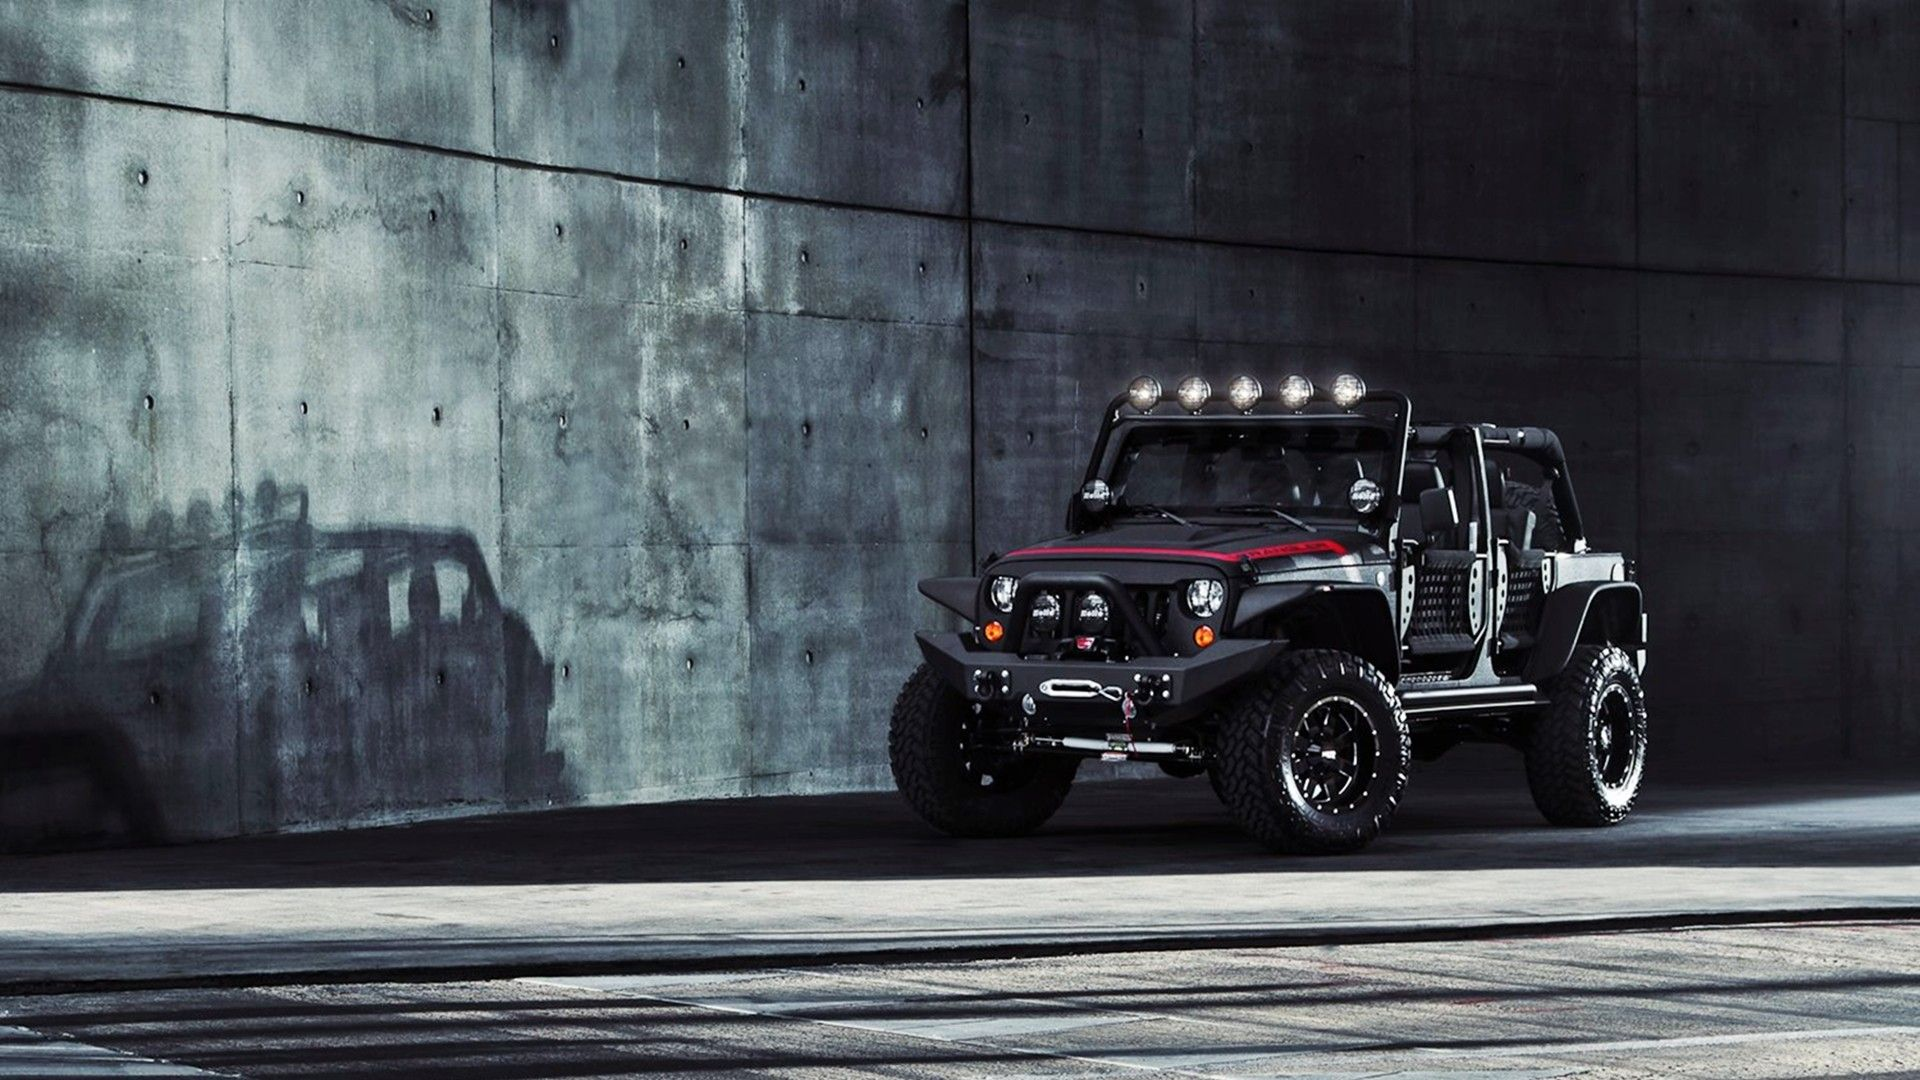 Cars Jeep Vehicles Suv Automobile